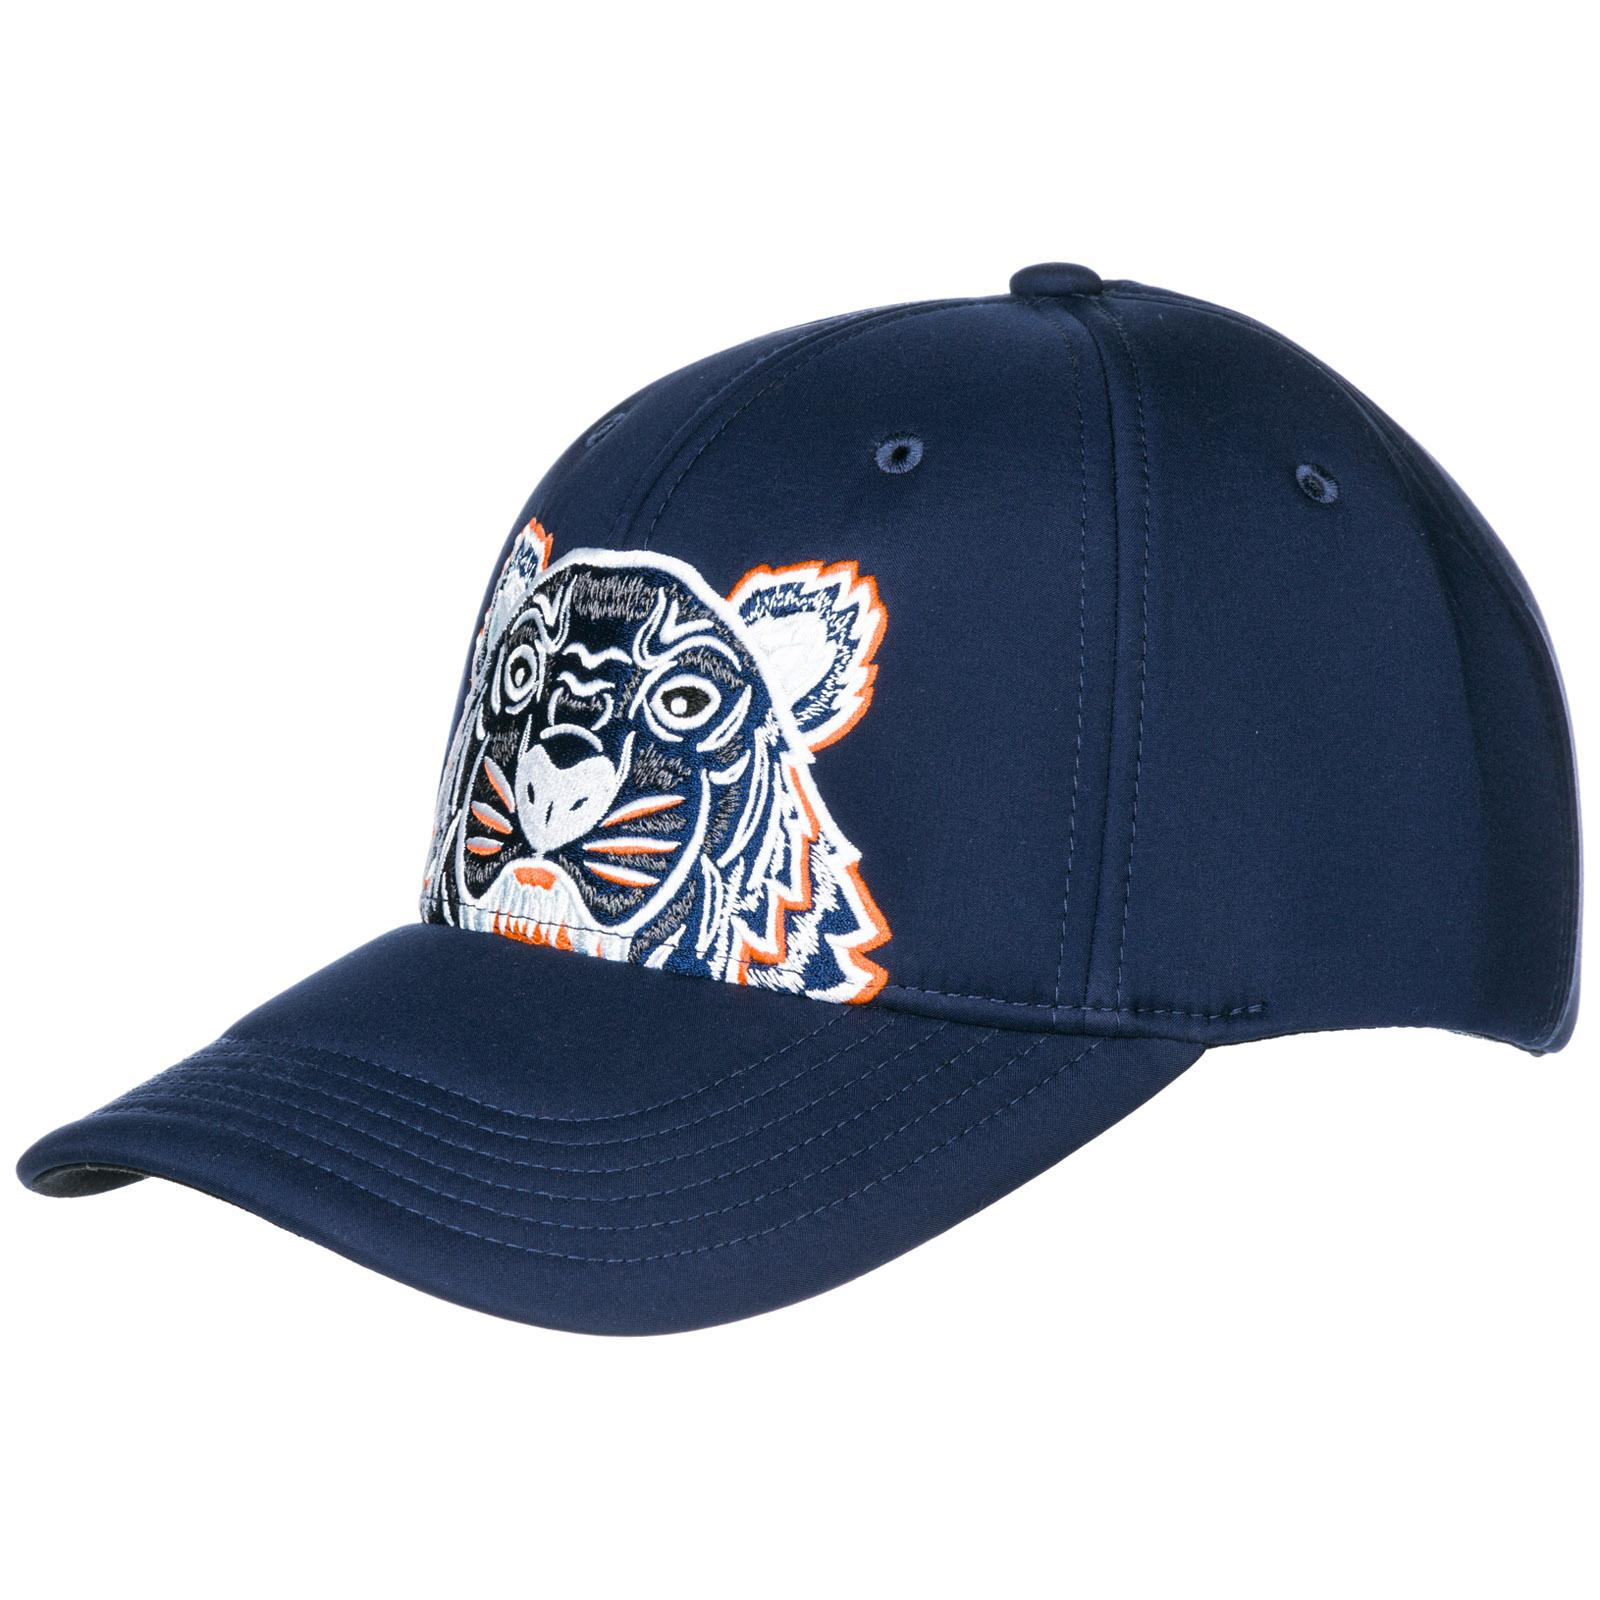 2f515ad22 Adjustable Men's Hat Baseball Cap Tiger in Blue